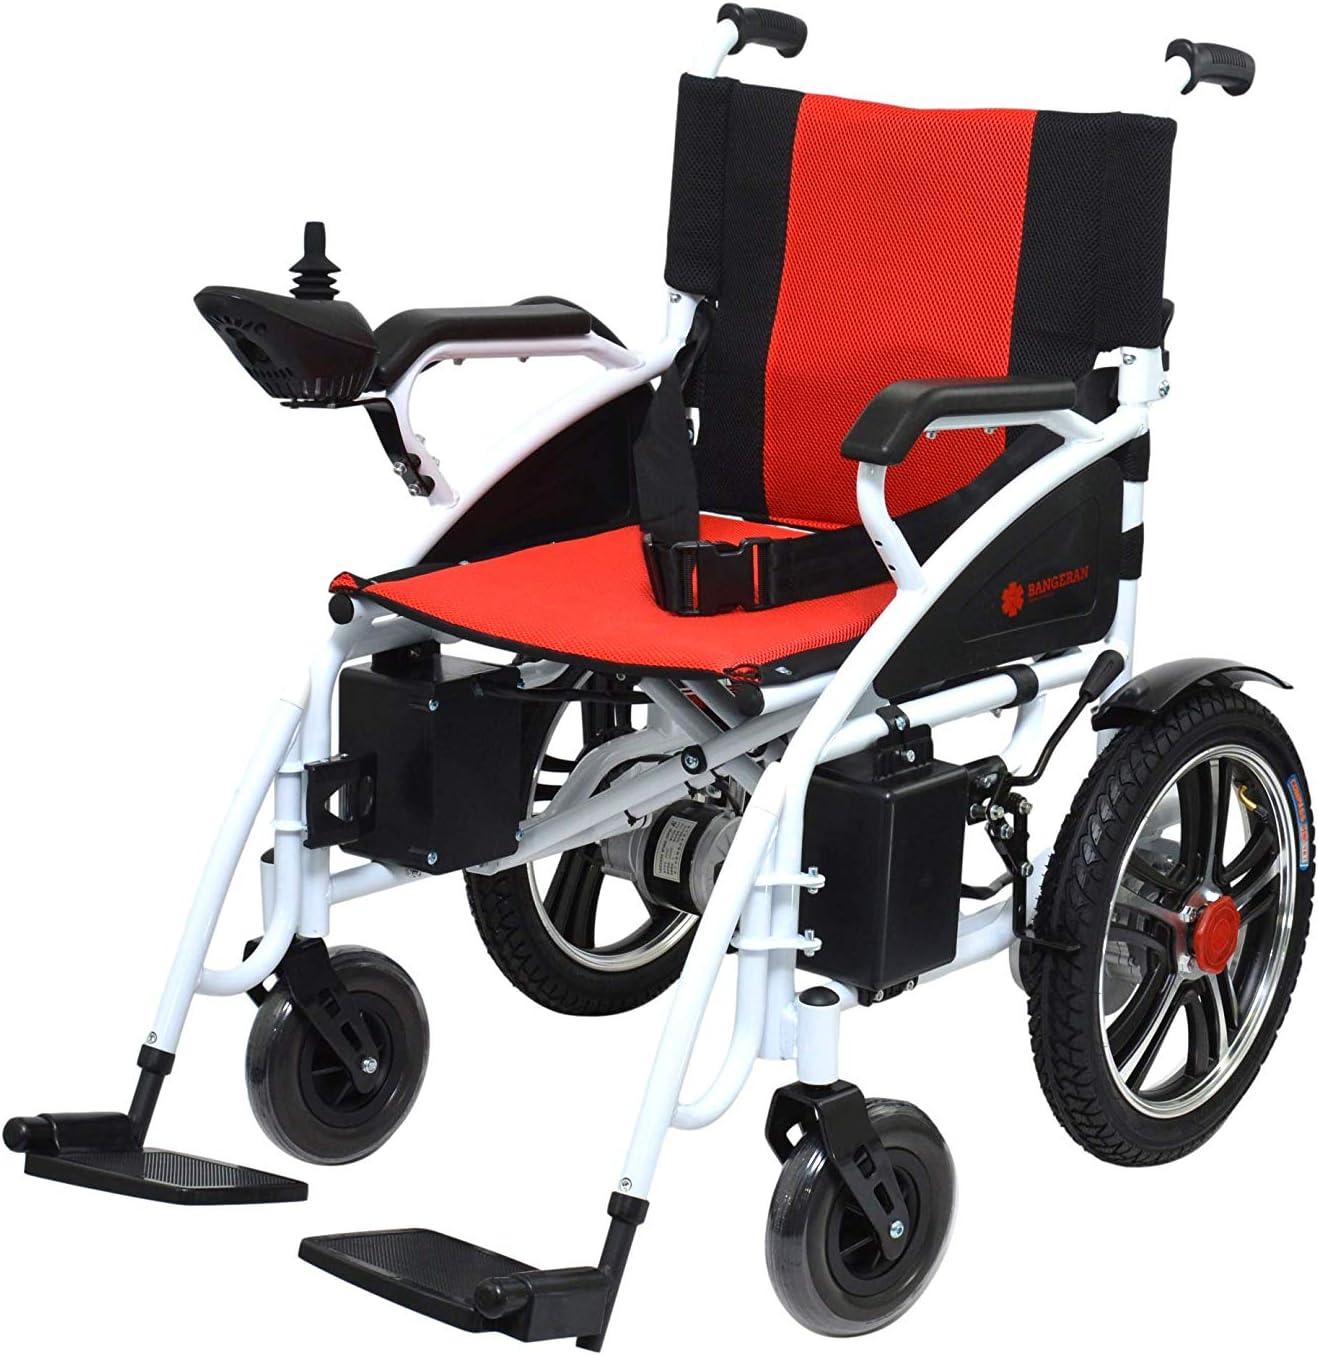 Popular overseas Hercules Deluxe Lite Electric Powered Wheelchair -Powerful Lightweight